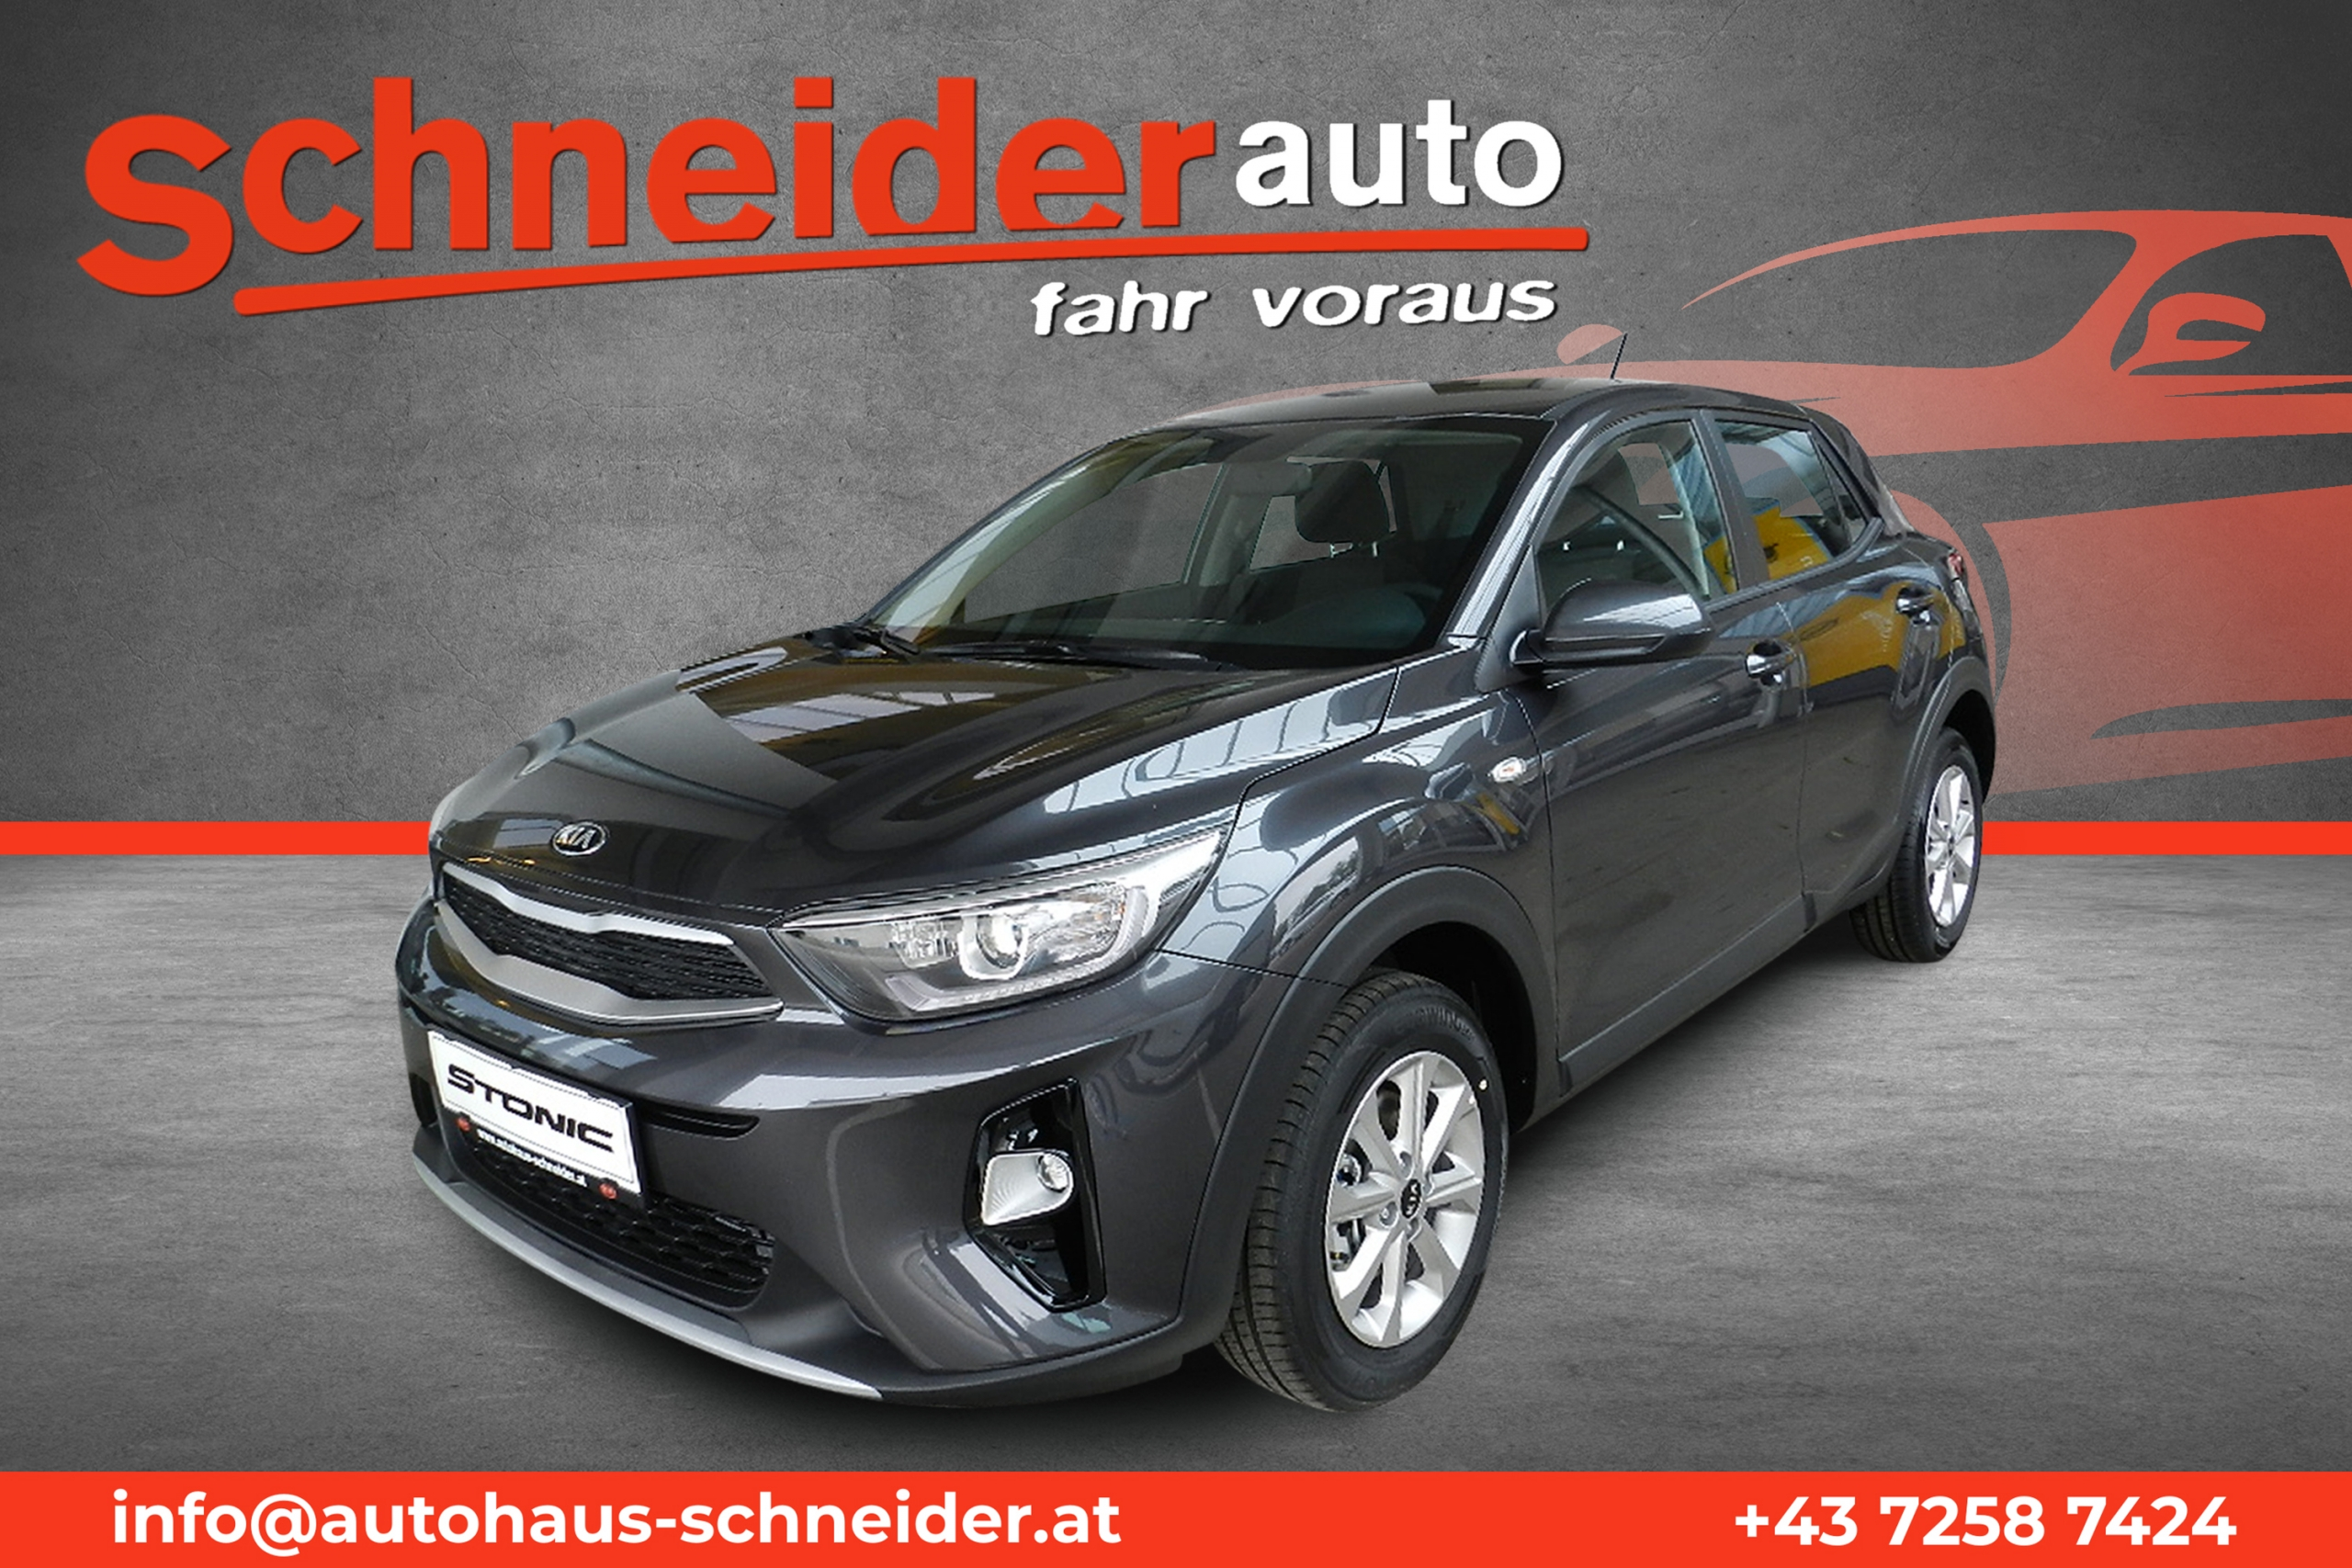 Fotoservice Opel Auto Schneider